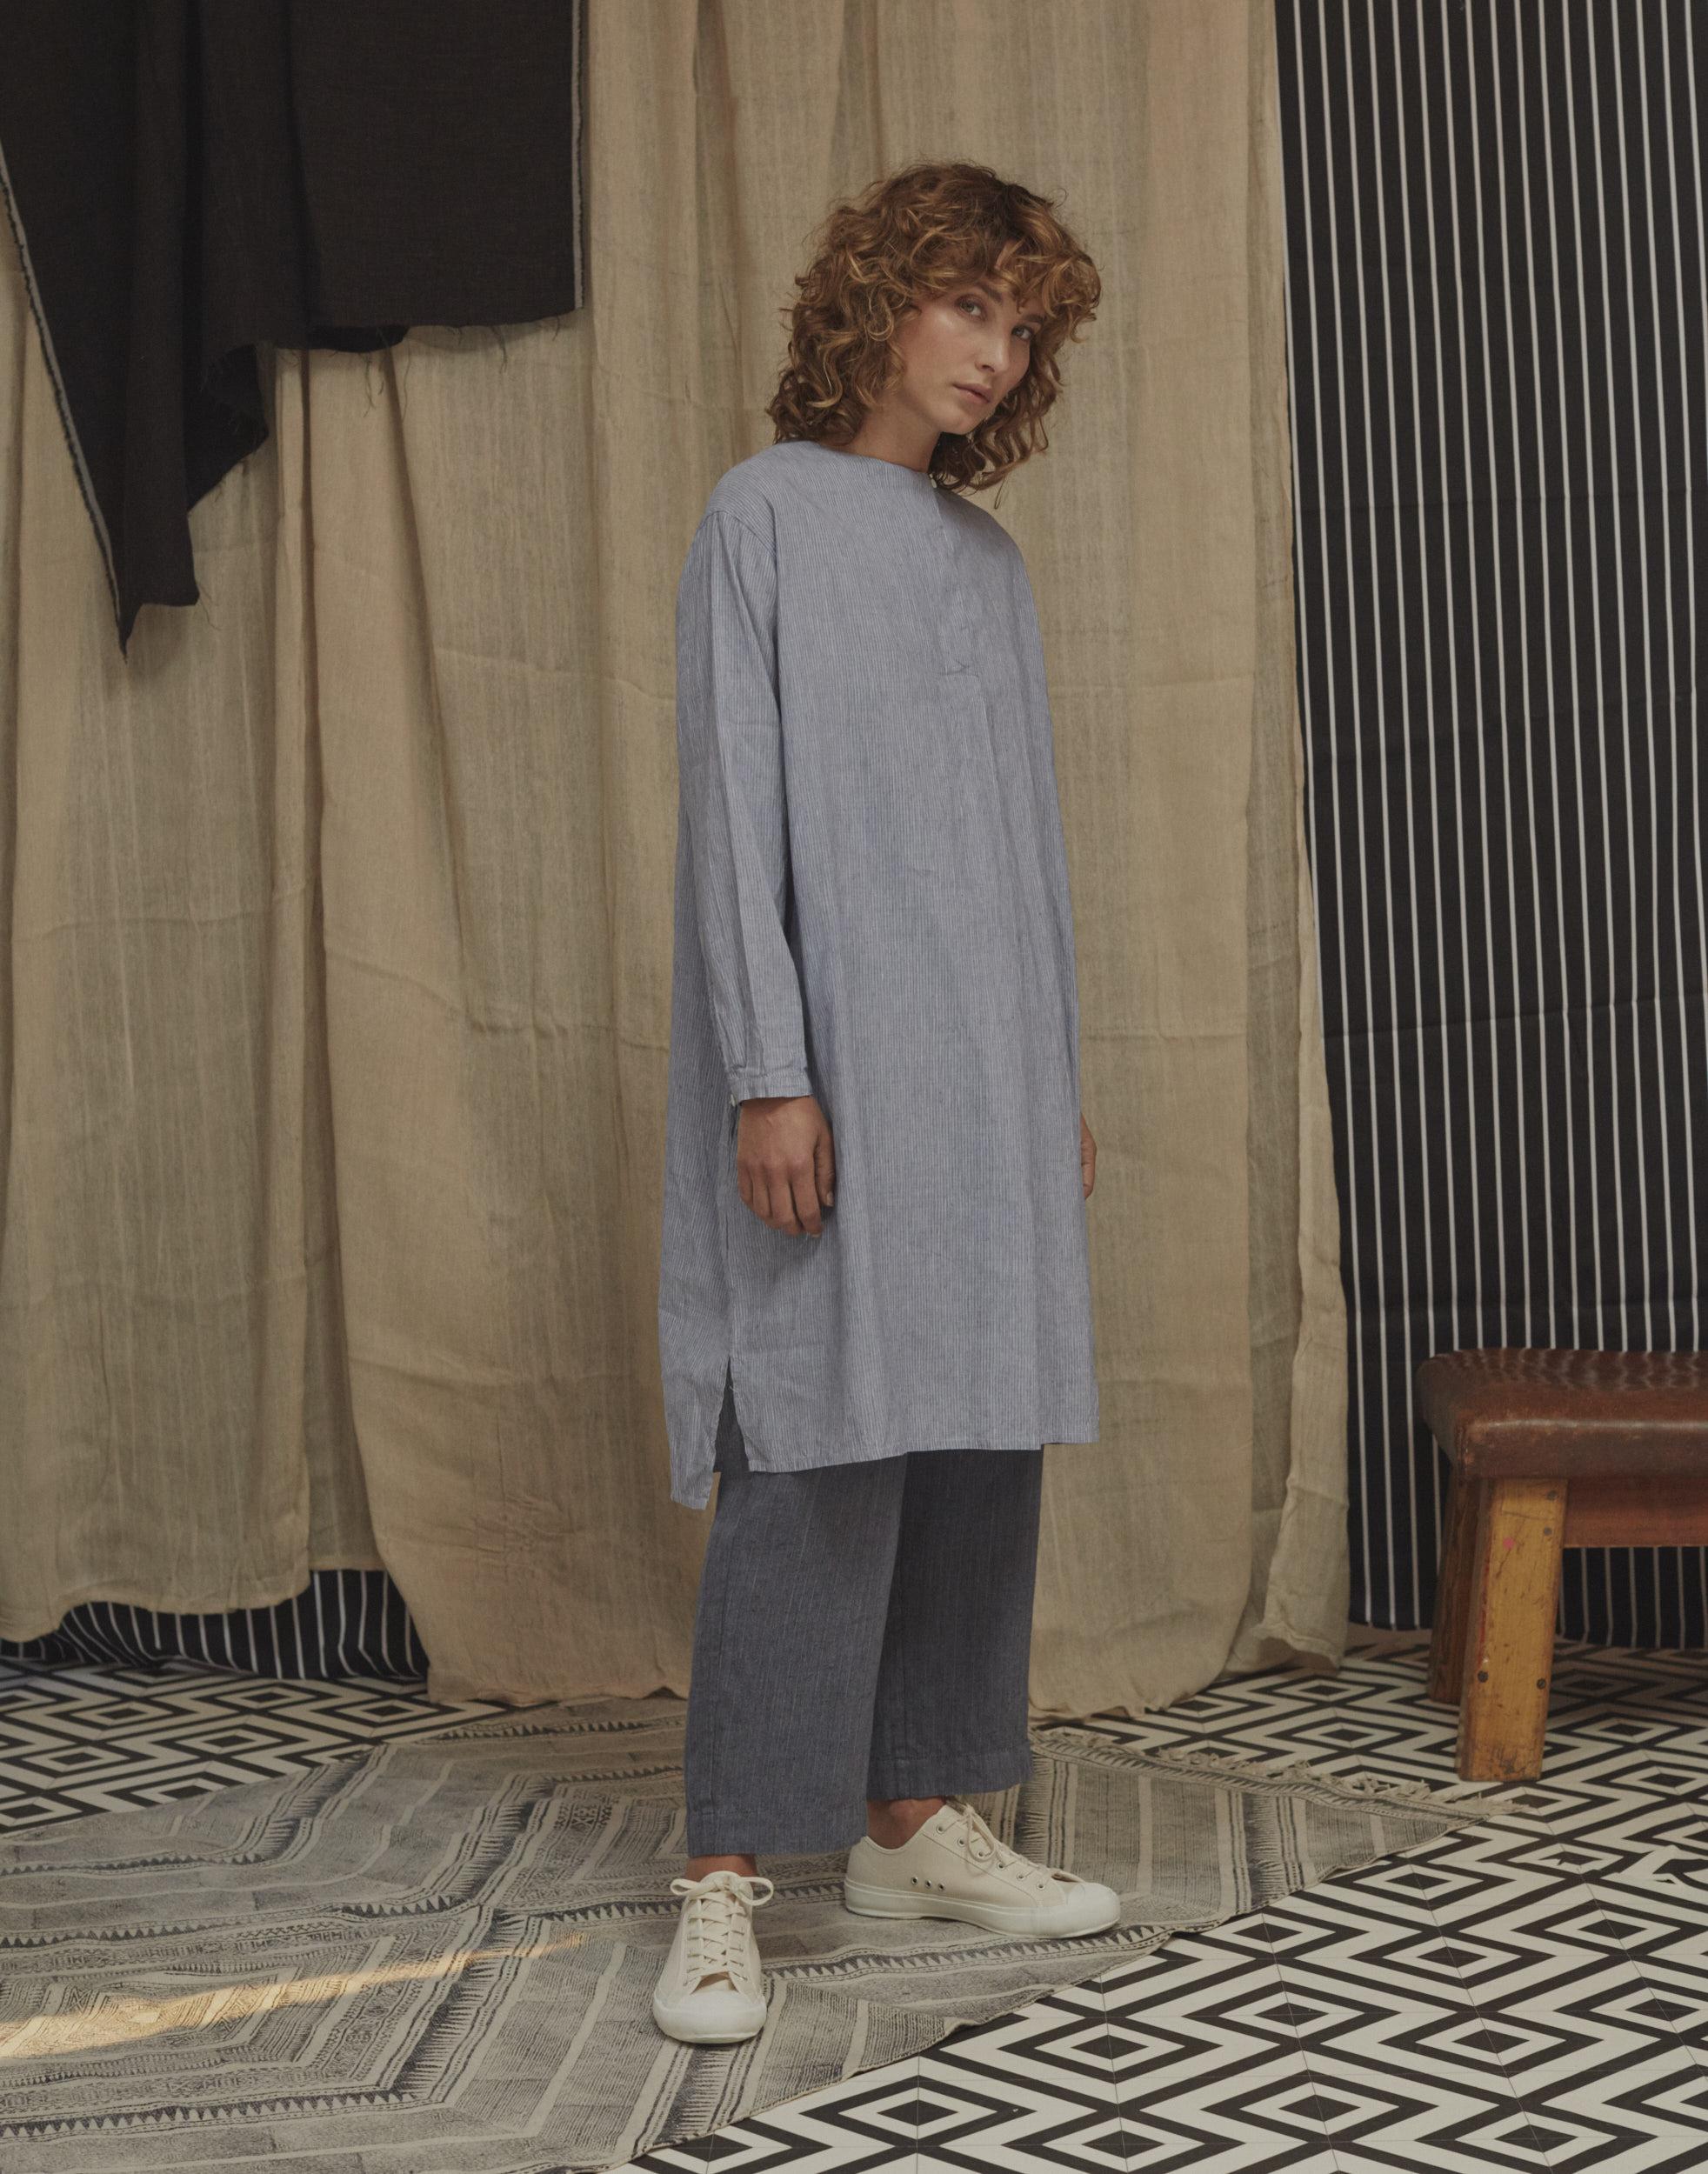 ymc-ss17-collection-okoro-women-fashion-folkr-3